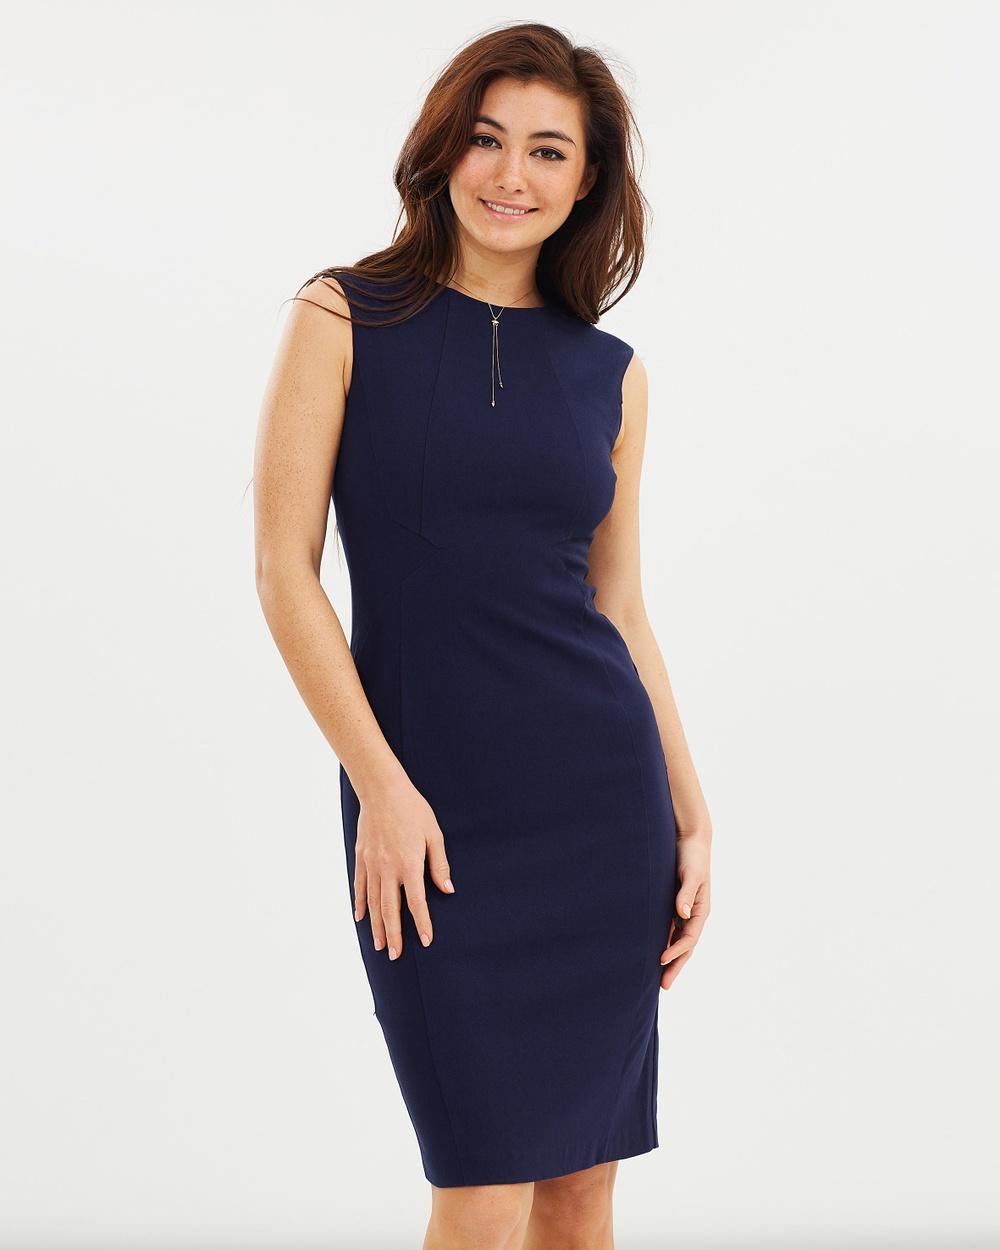 Dorothy Perkins Bengaline Arrow Waist Dress Dresses Navy Blue Bengaline Arrow Waist Dress